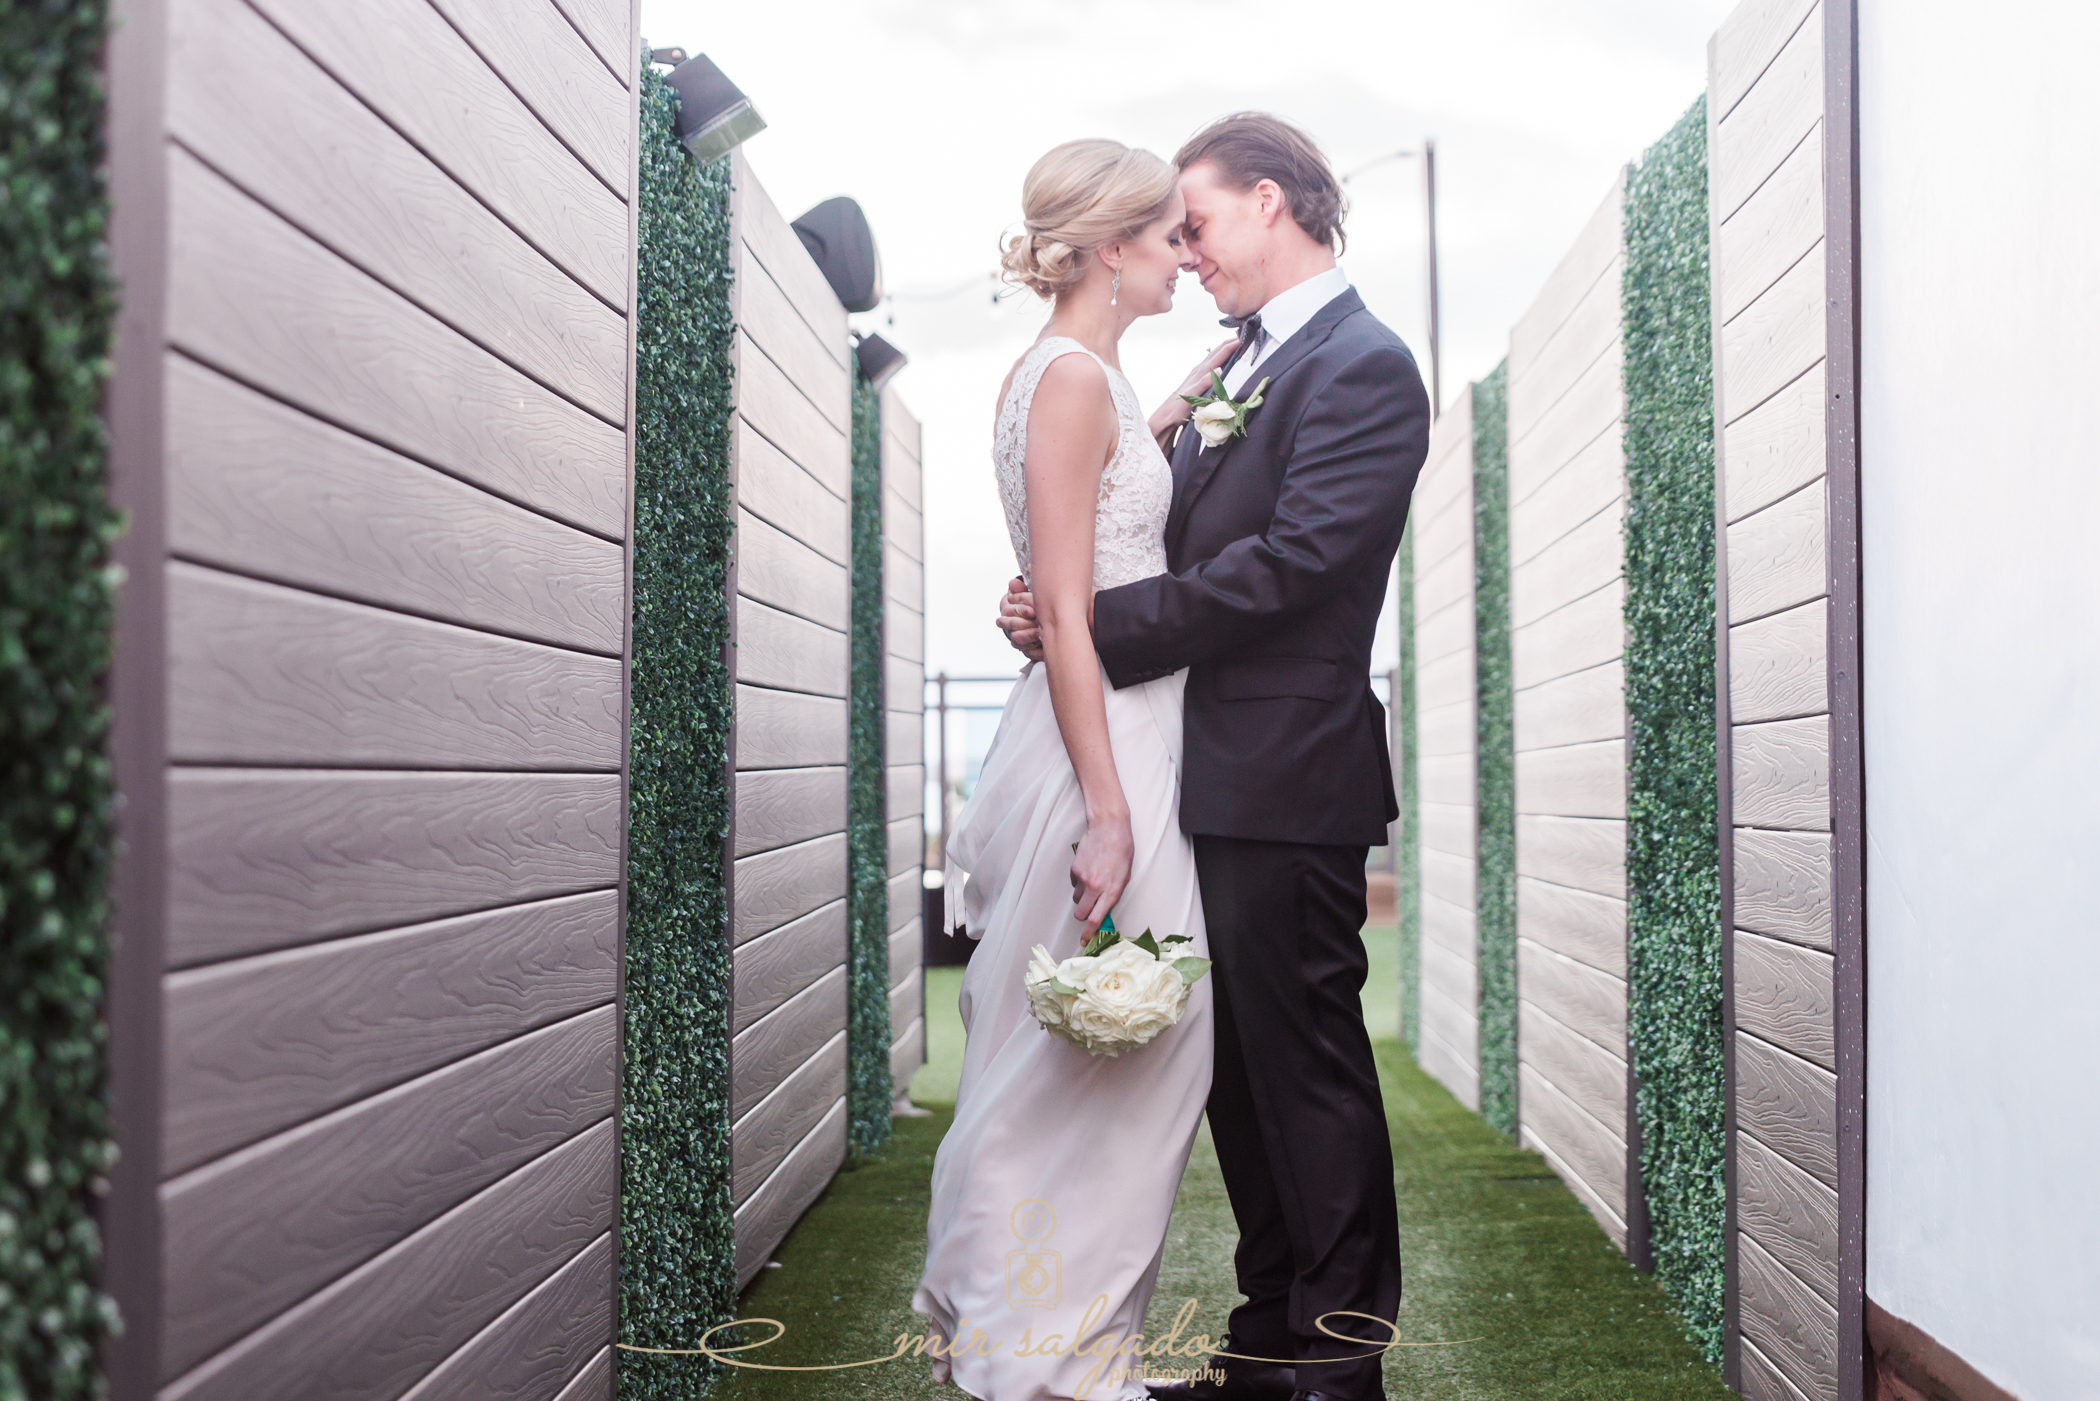 Hotel-Zamora-wedding, ST.Pete-wedding-photographer, Tampa-wedding-photographer